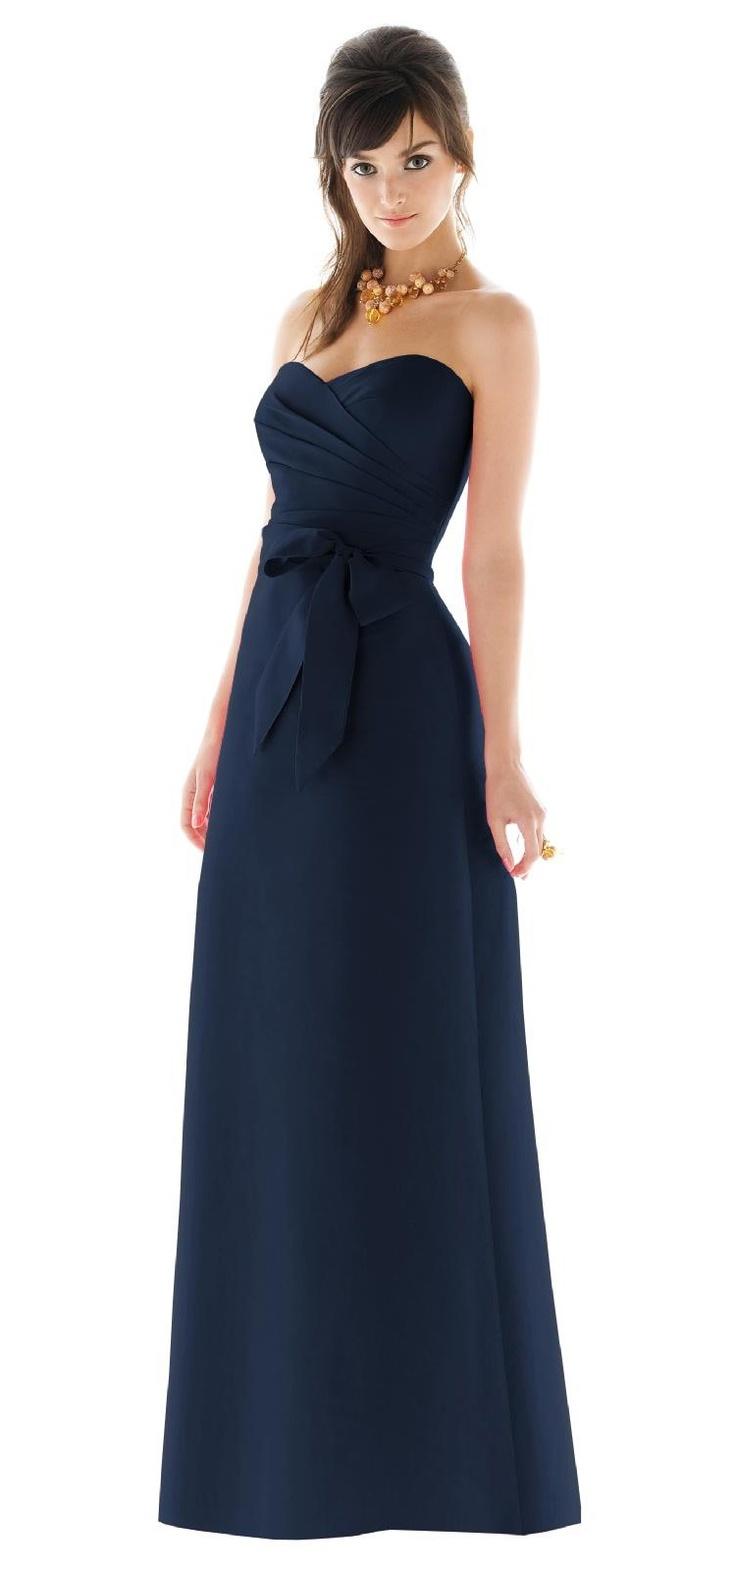 alfred sung d457 midnight helene bridesmaid dresses pinterest alfred sung navy blue. Black Bedroom Furniture Sets. Home Design Ideas